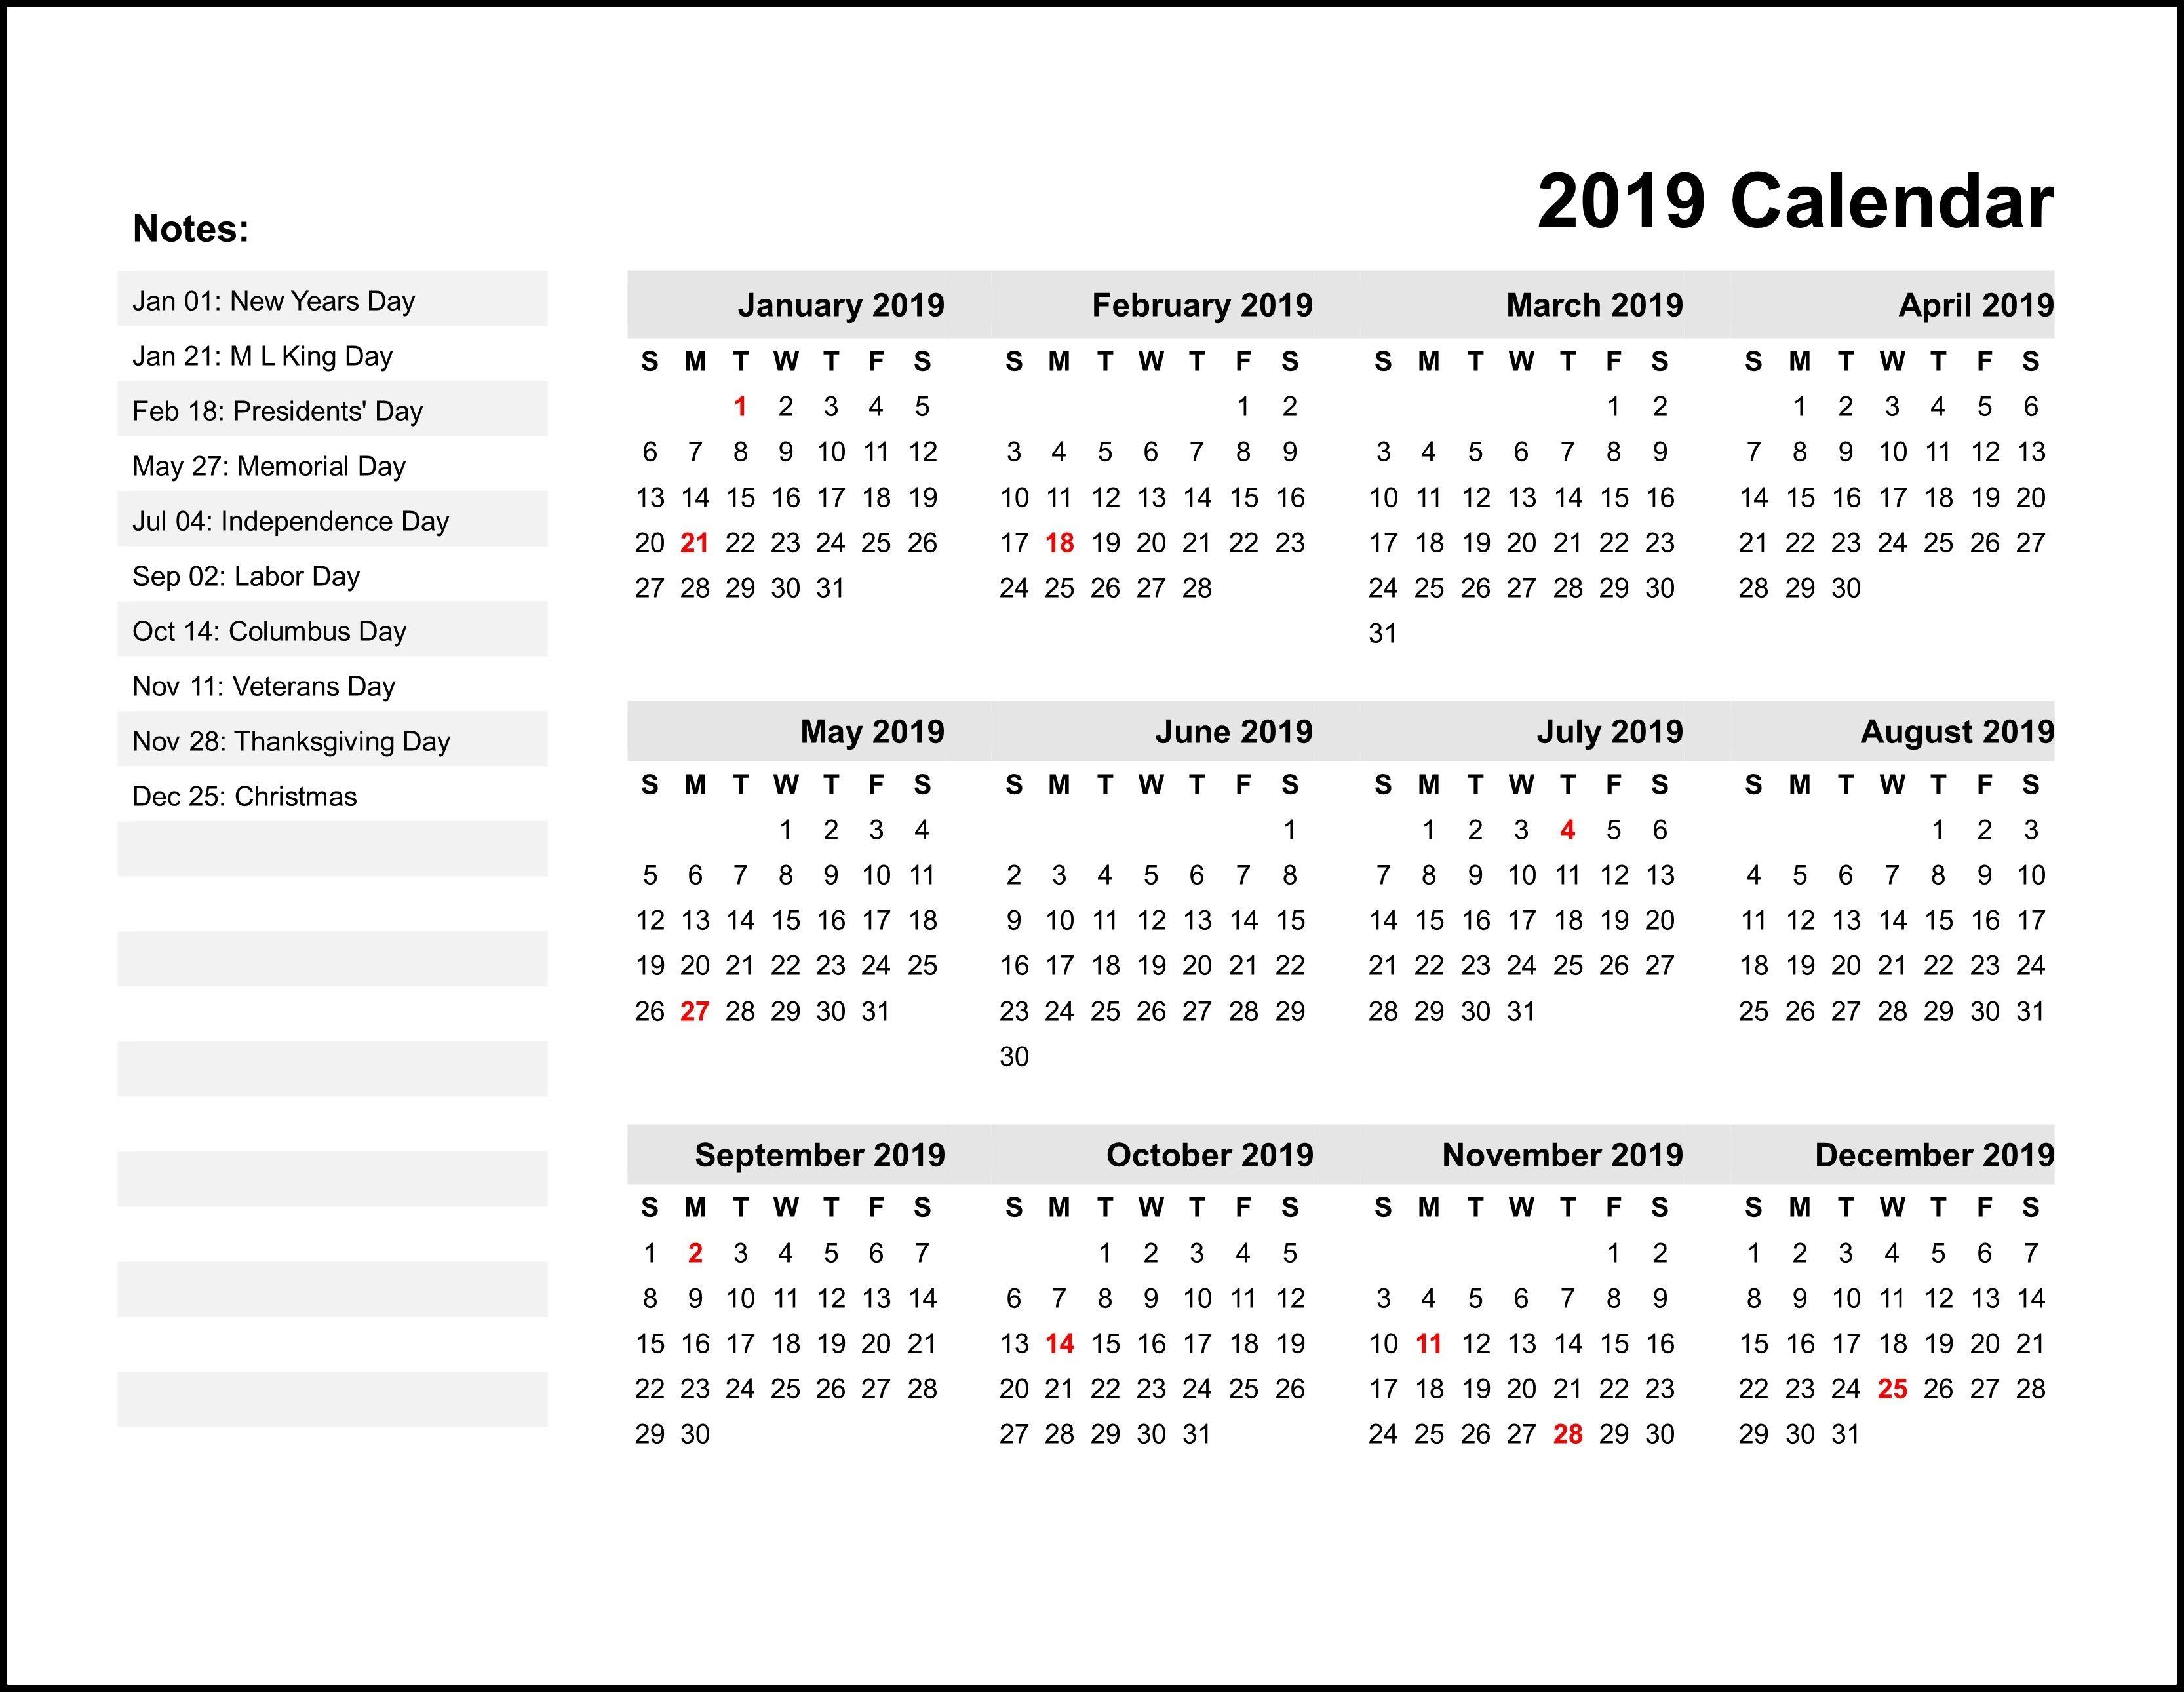 Calendar 2019 India Holidays Calendar2019 Printablecalendar